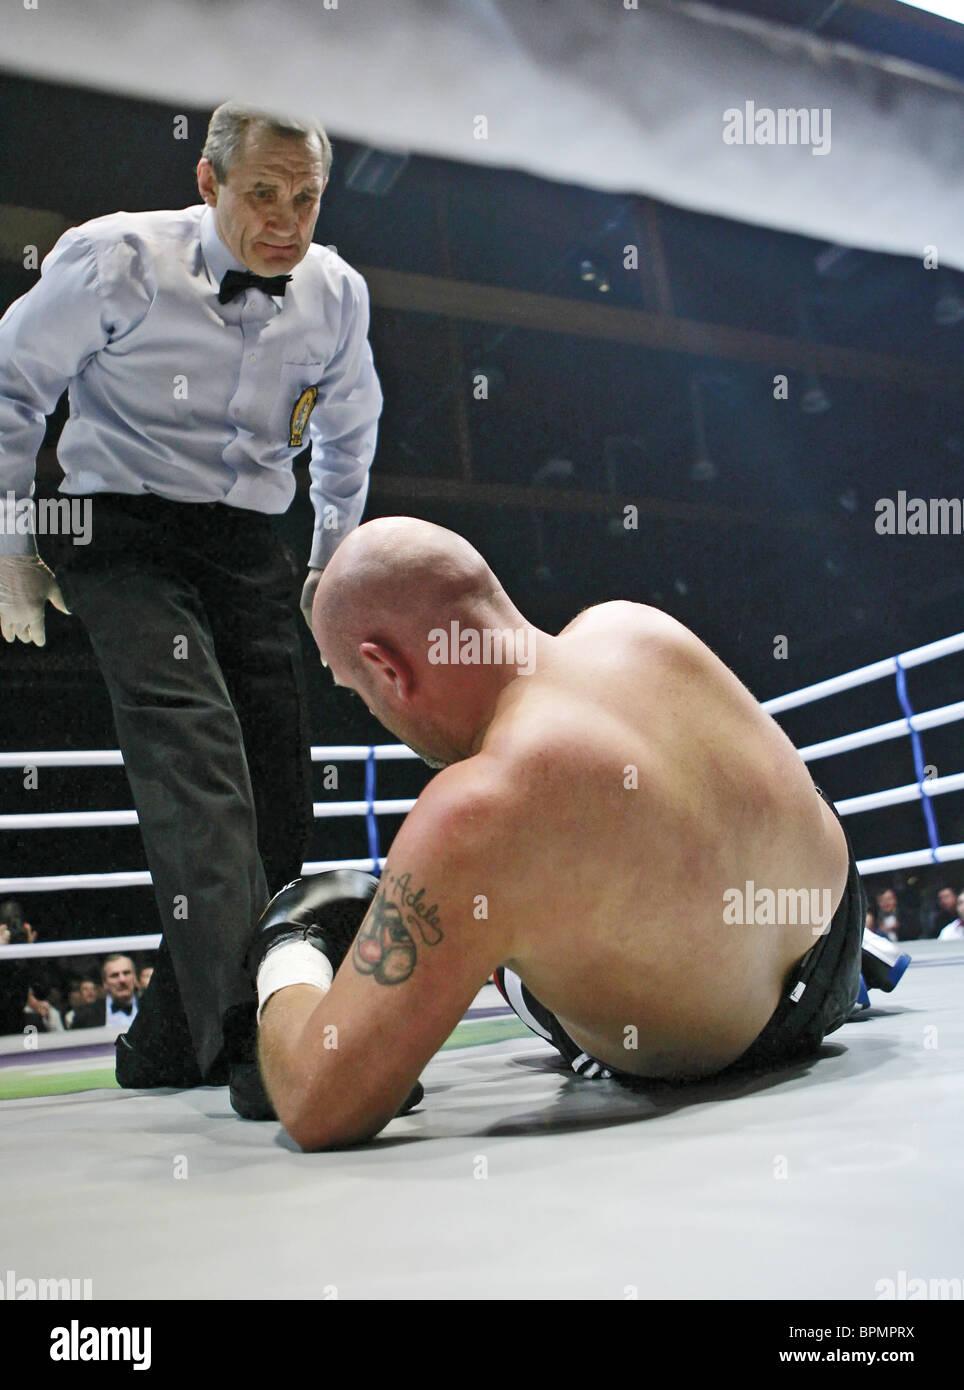 Former WBC Heavyweight Champ Oleg Maskaev defeats Richie Boruff - Stock Image